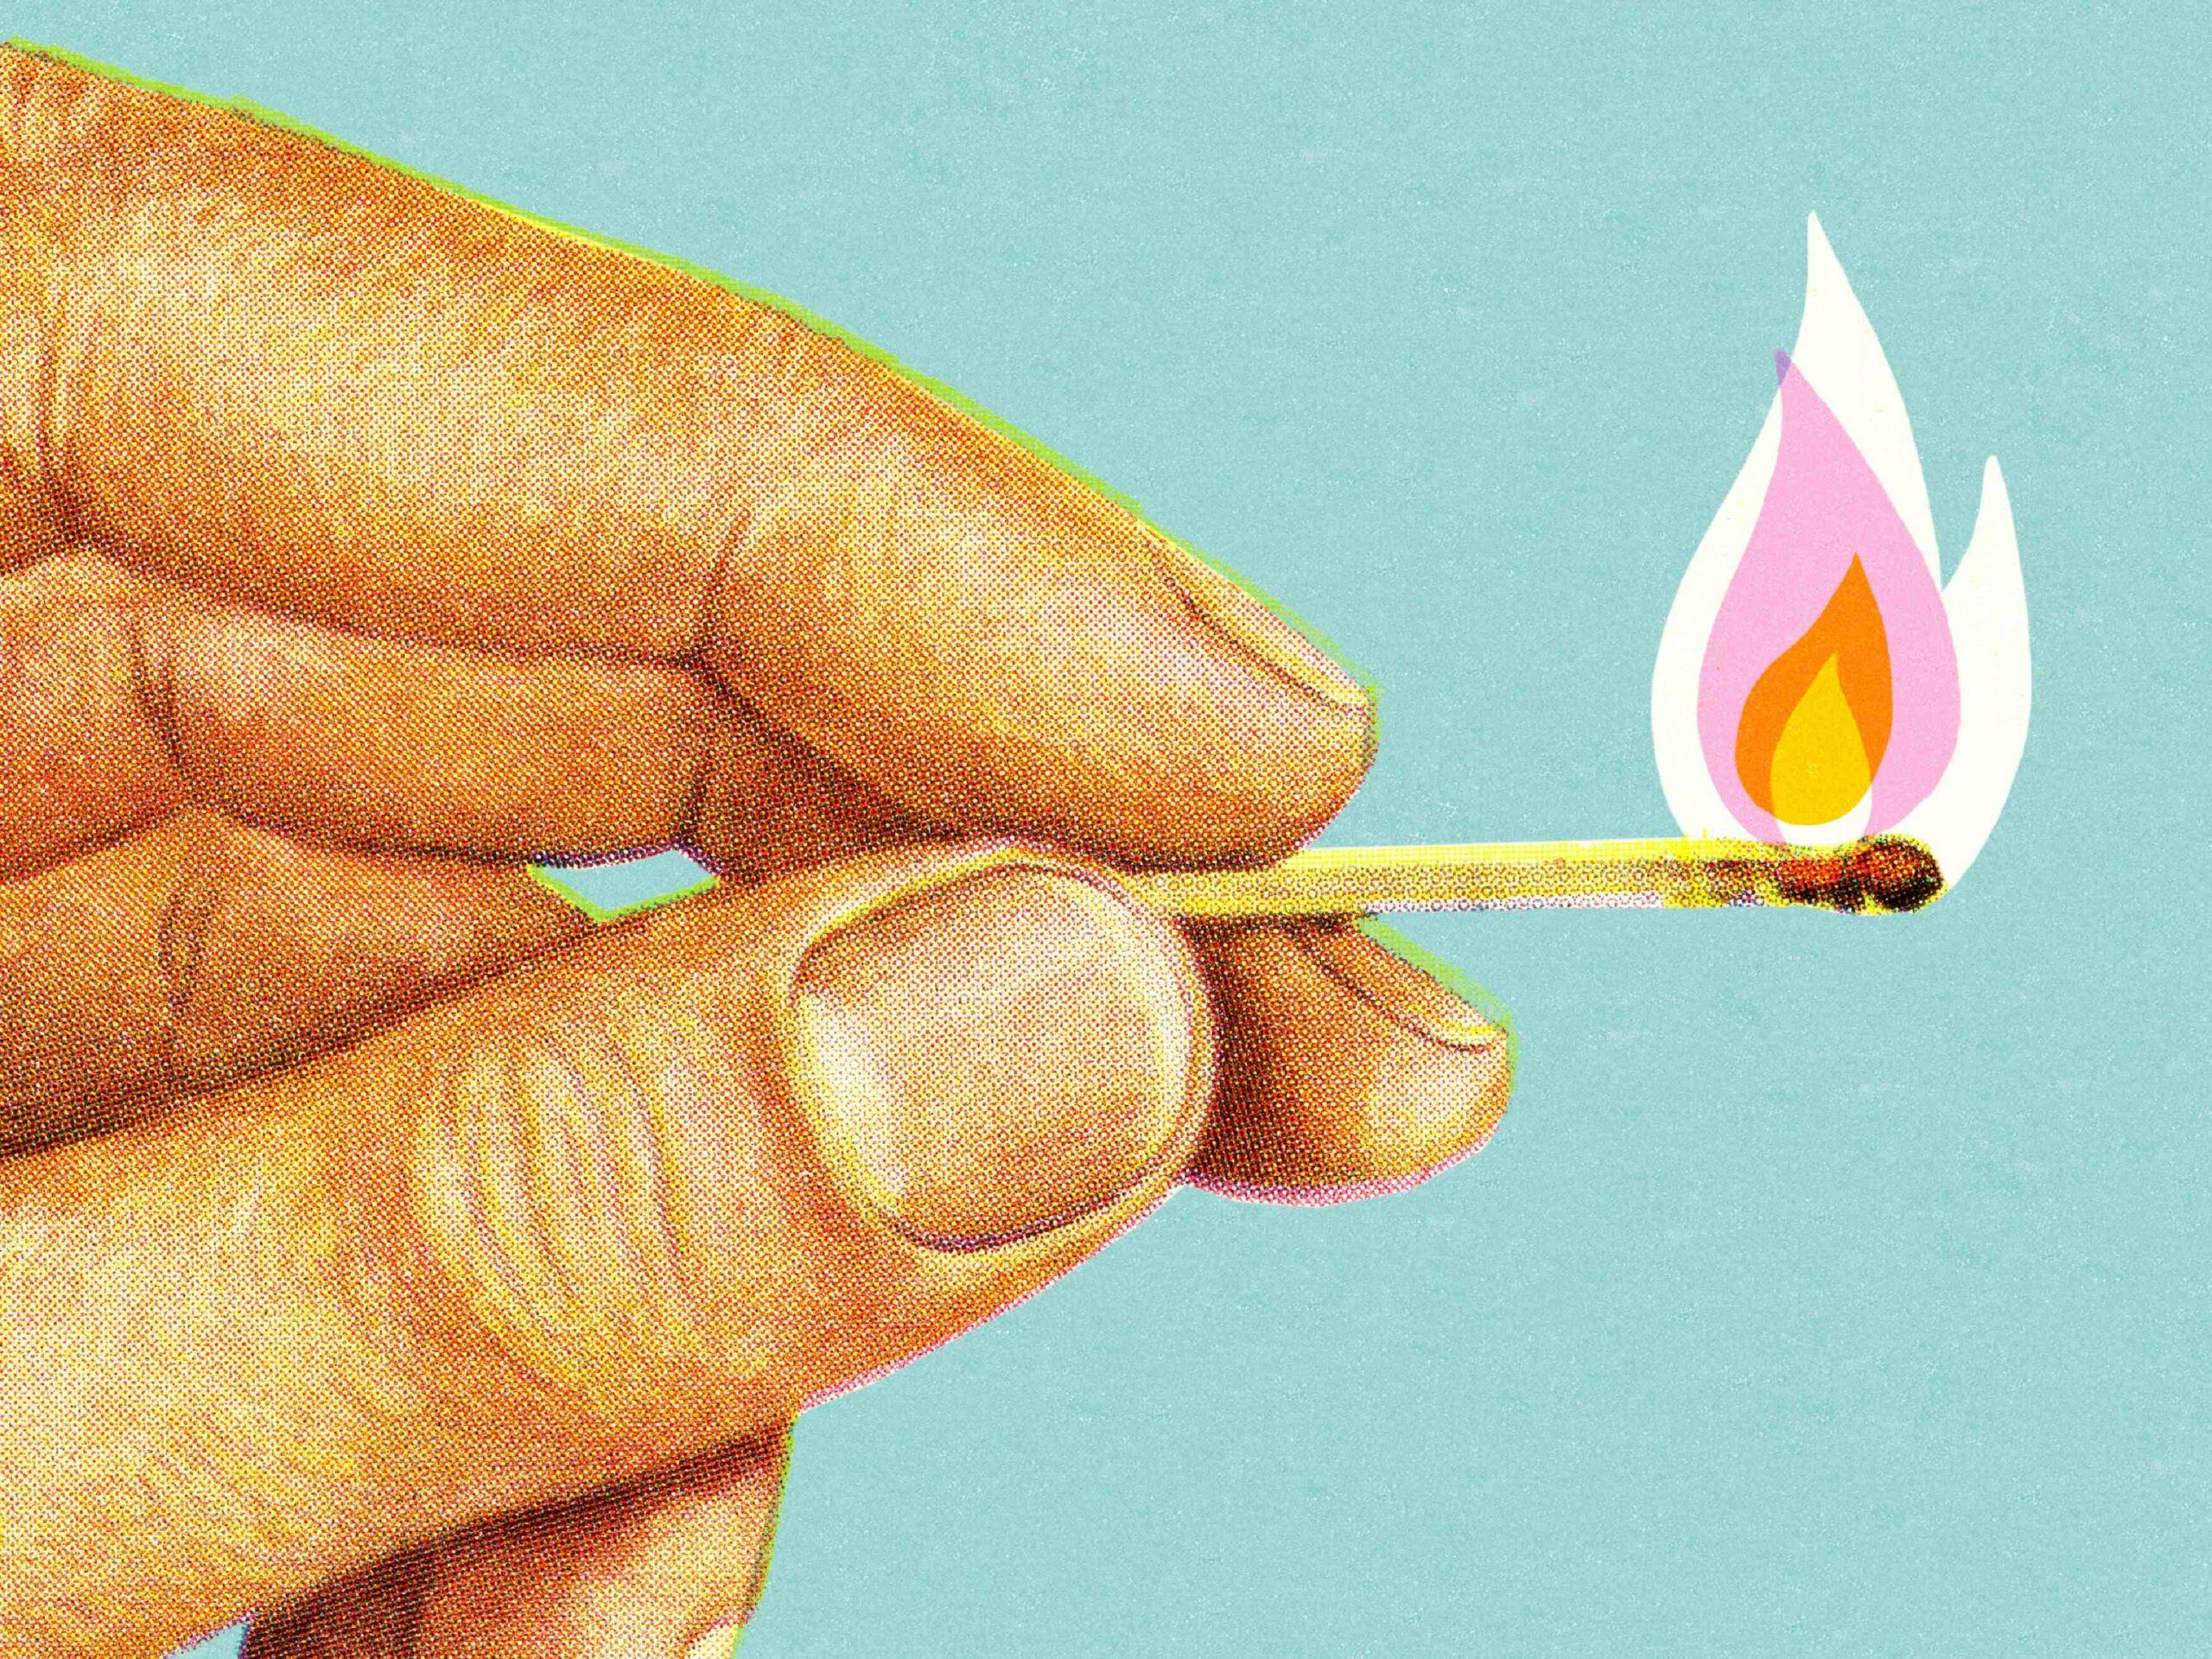 Comment soigner une brûlures